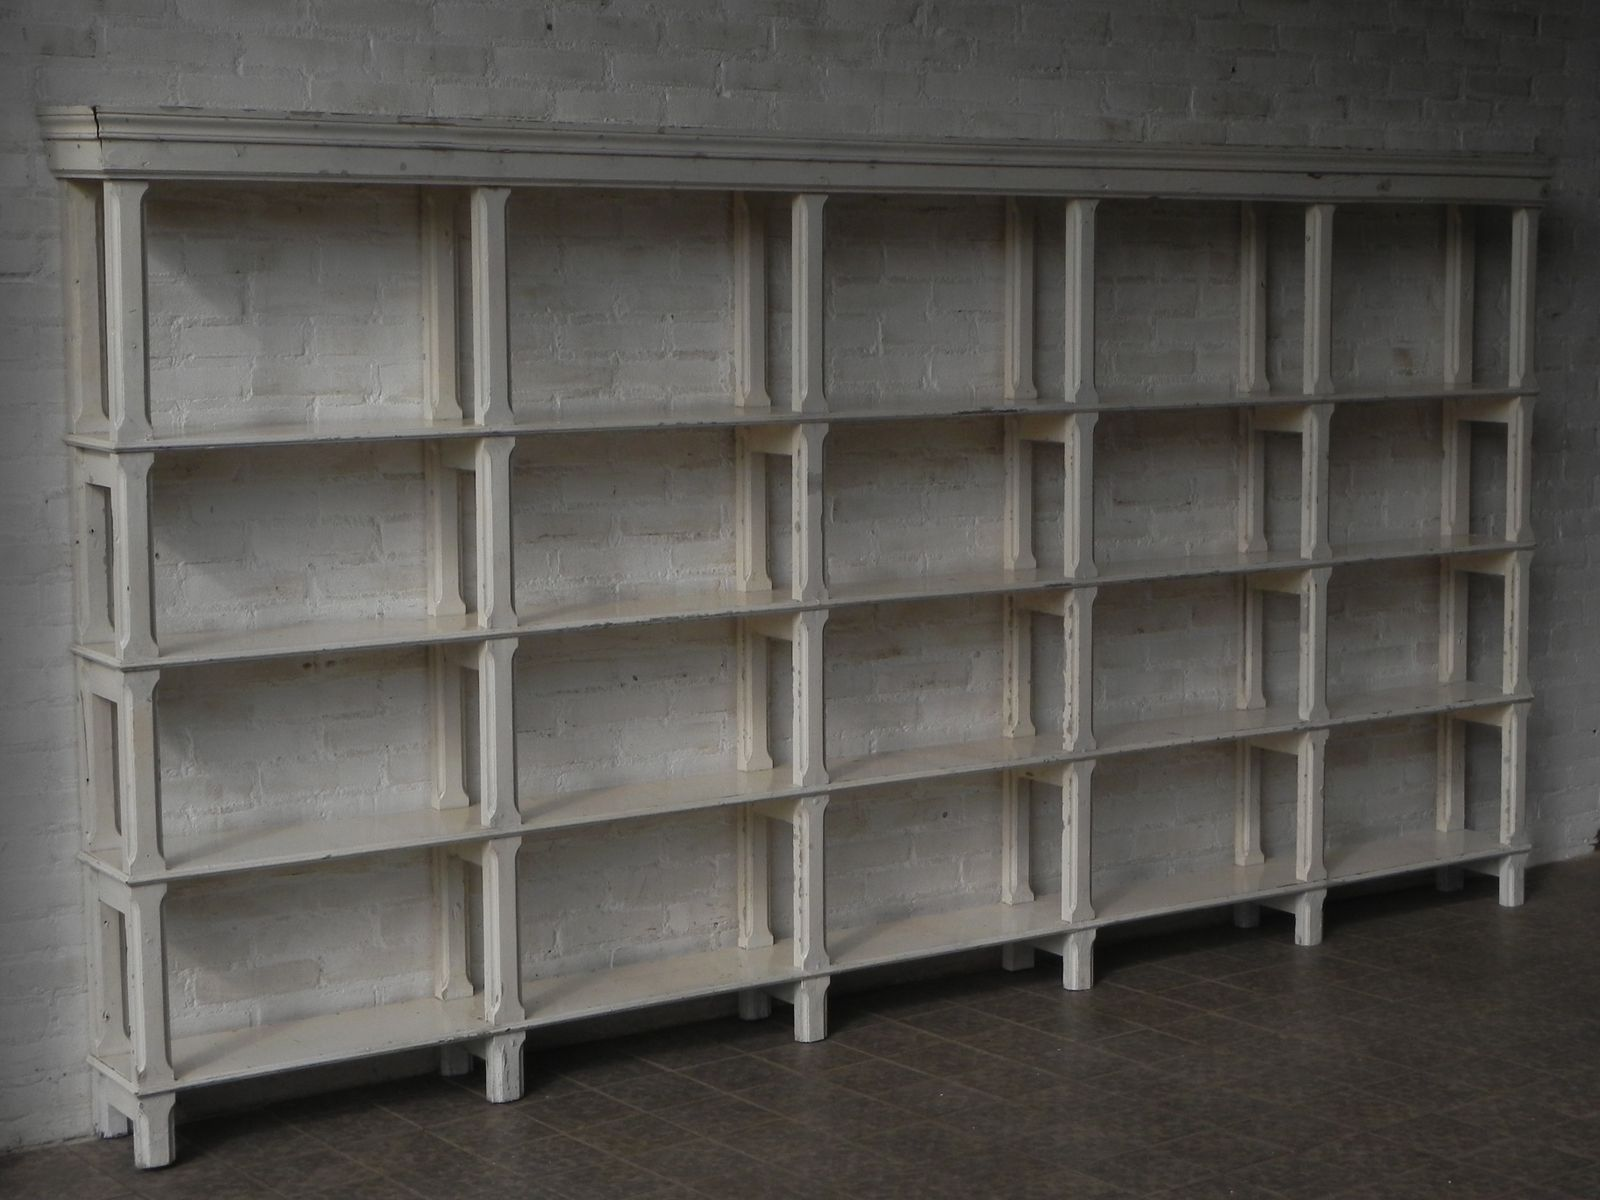 gro es vintage regalsystem aus holz bei pamono kaufen. Black Bedroom Furniture Sets. Home Design Ideas